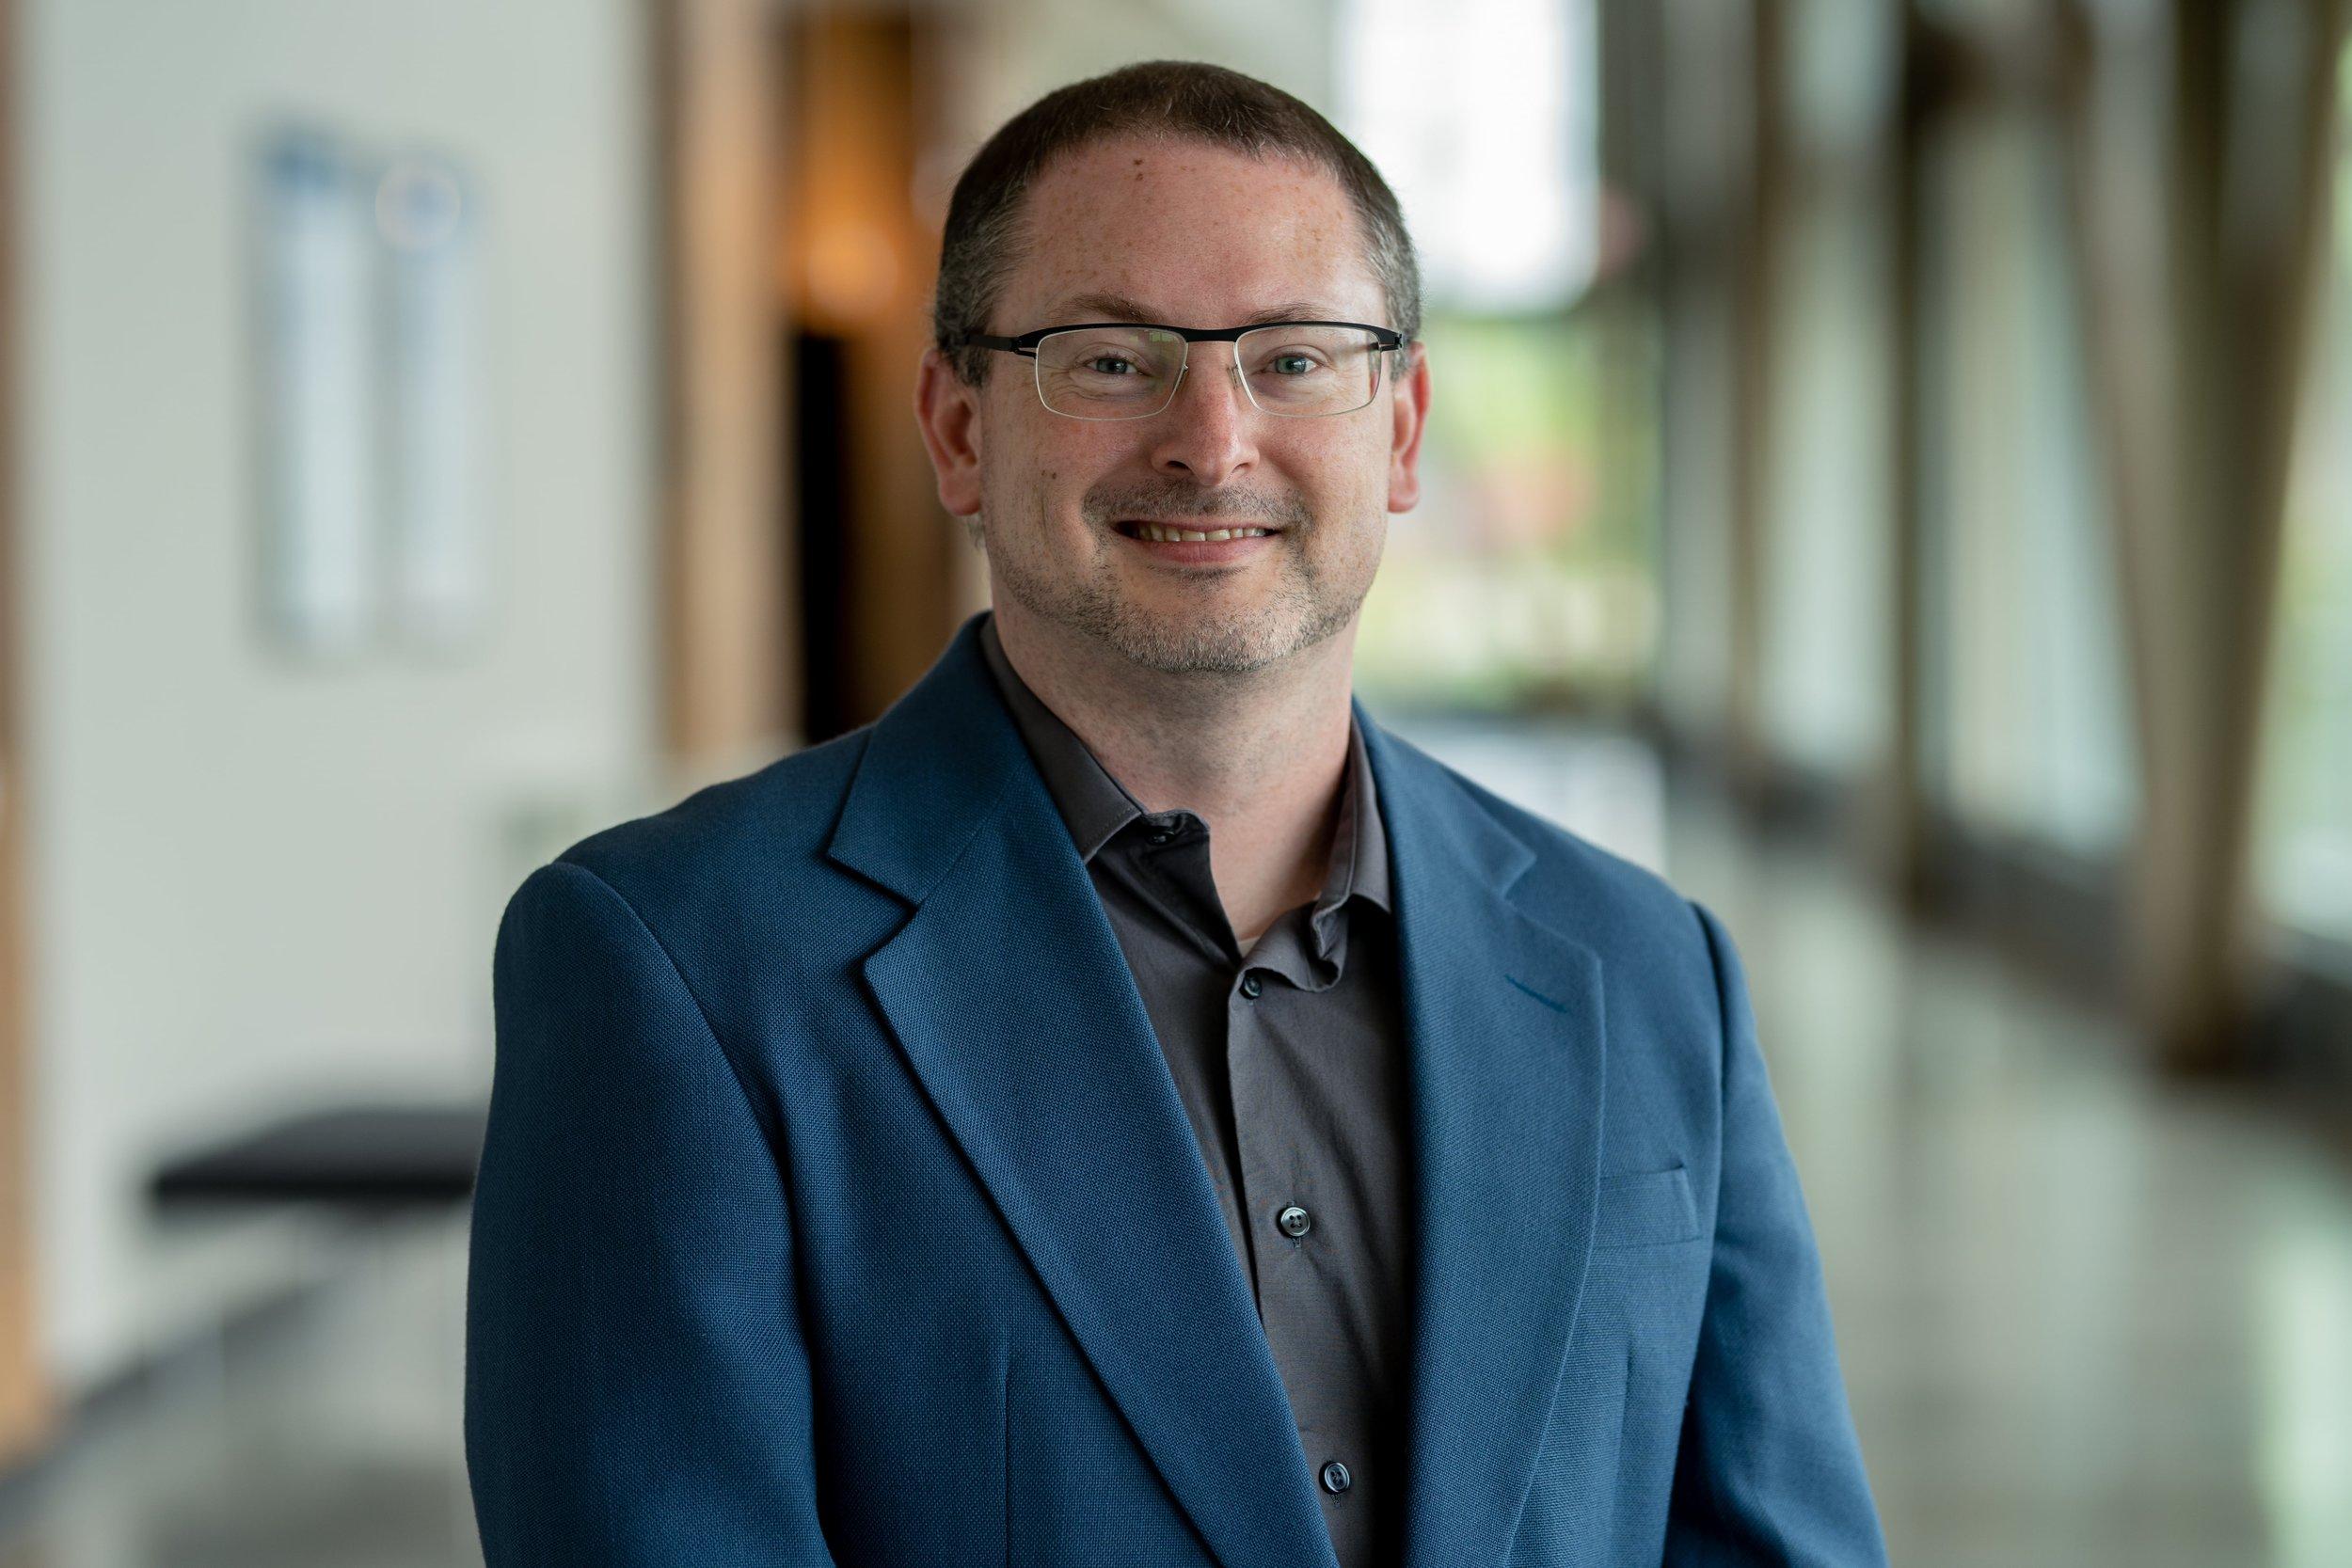 Jim Frush - Loan Processing Specialist